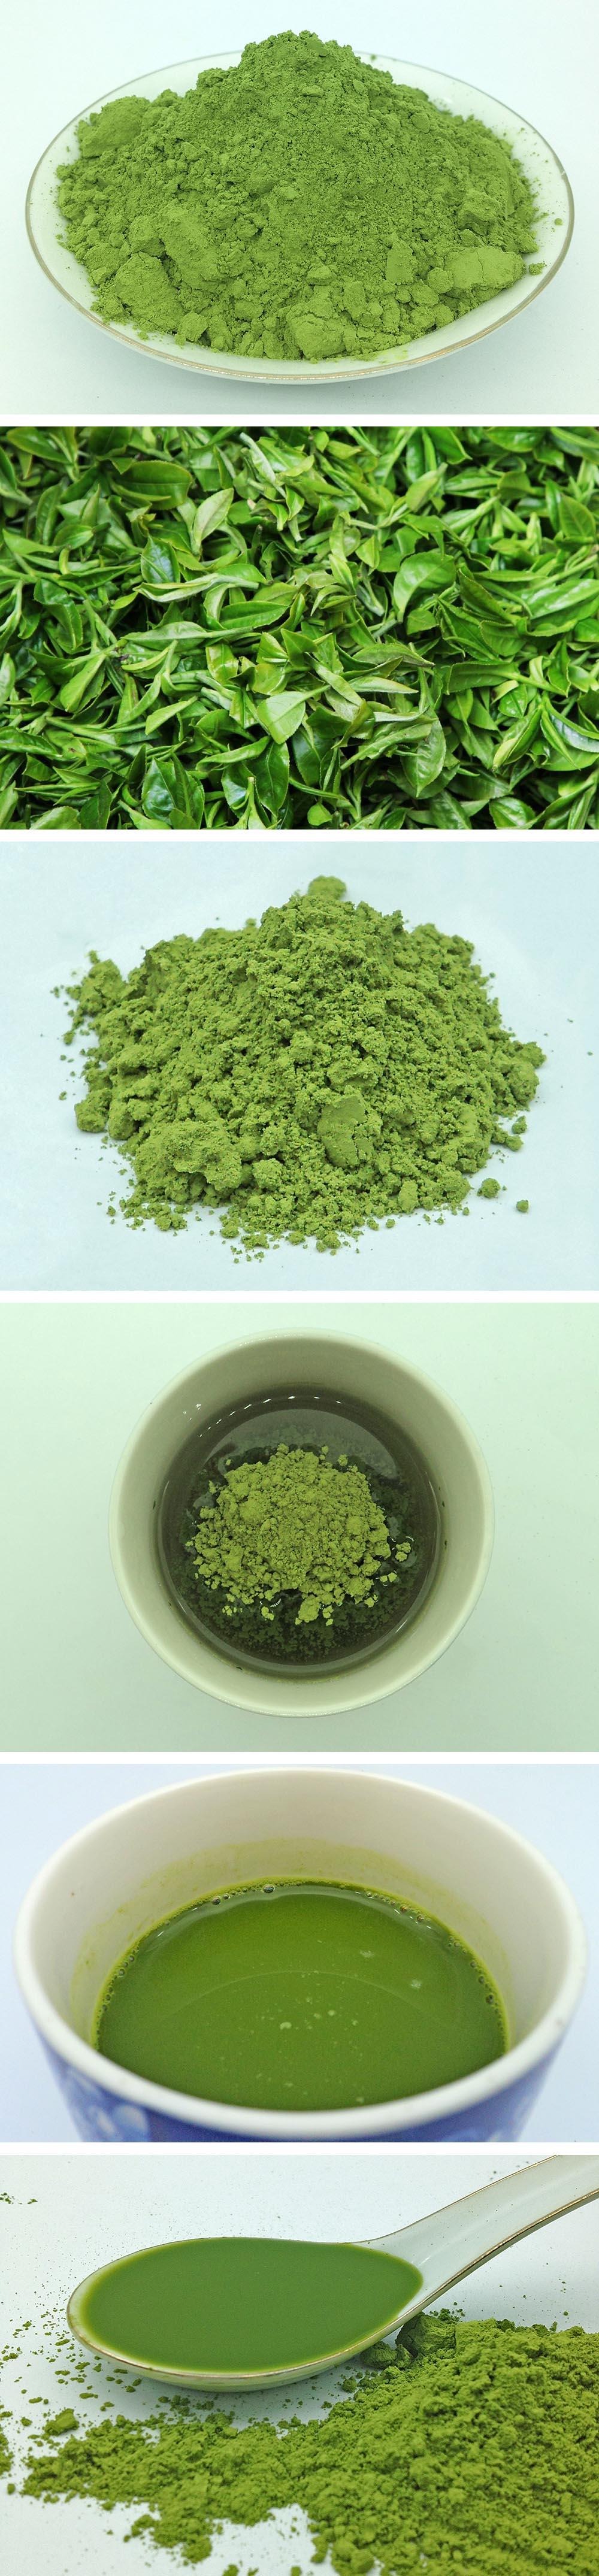 Top Quality Green Tea Matcha Powder from Matcha Wholesale - 4uTea | 4uTea.com